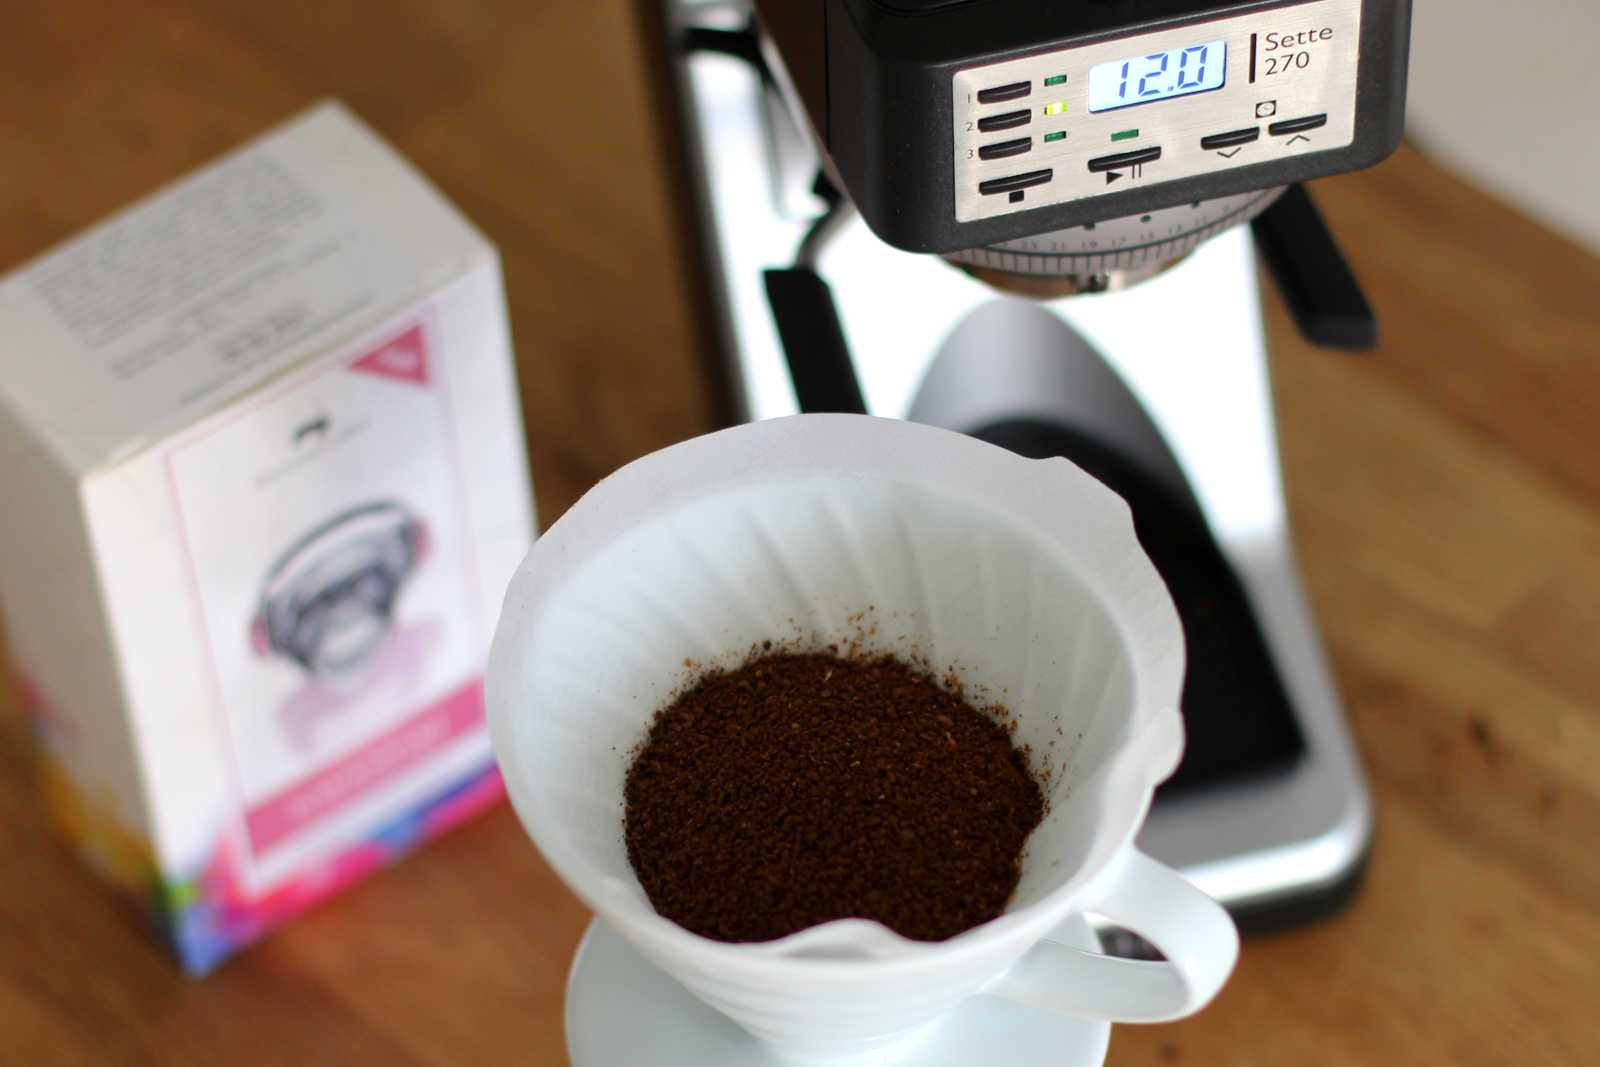 baratza-sette-270_filterkaffee